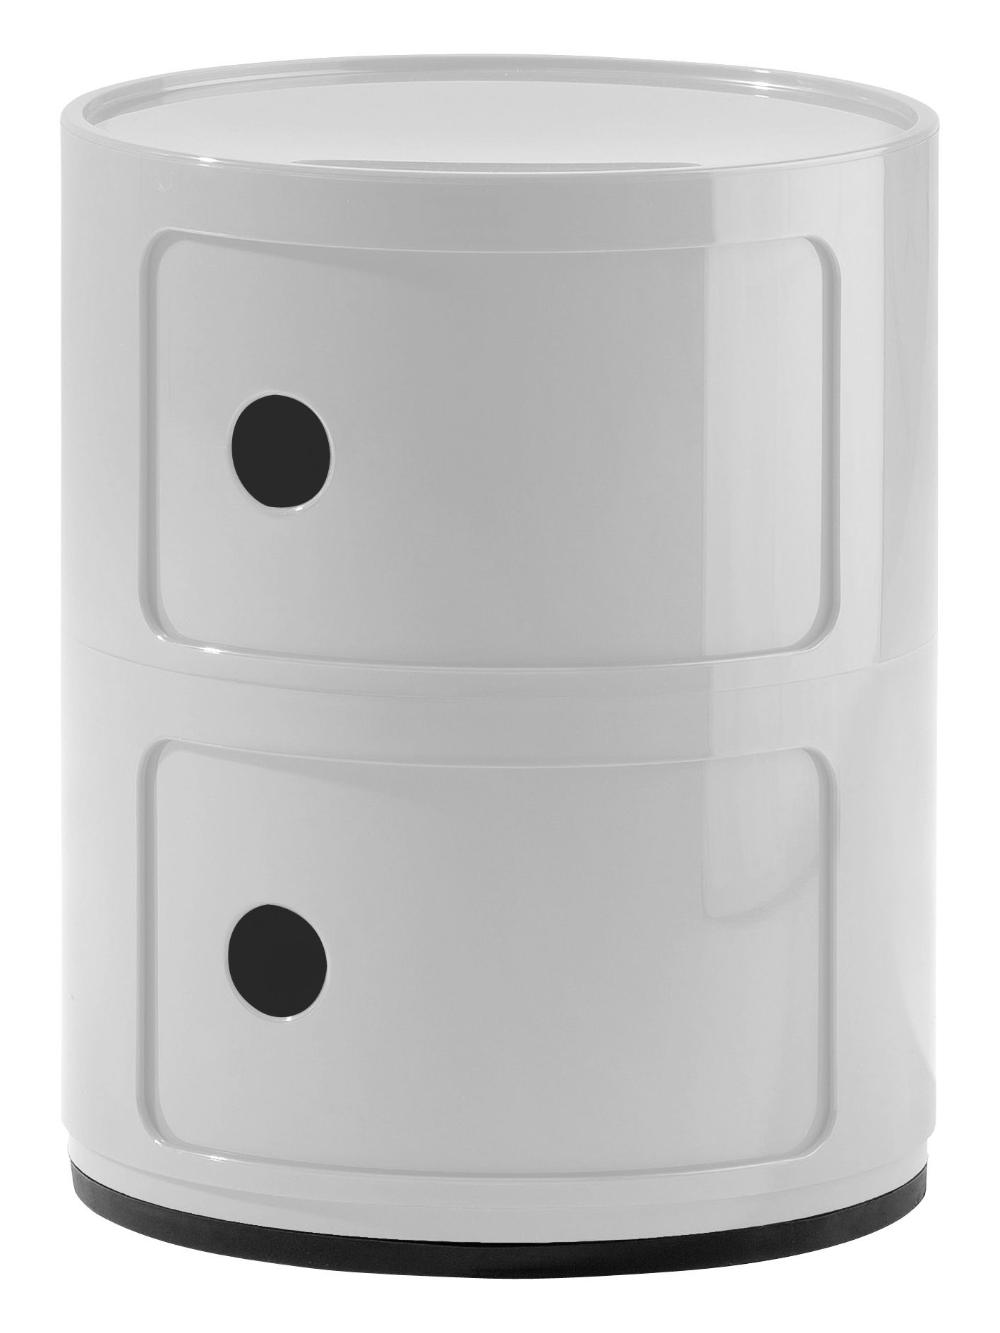 Rangement Componibili Kartell 2 Tiroirs Blanc Made In Design Kartell Rangement Et Meuble Rangement